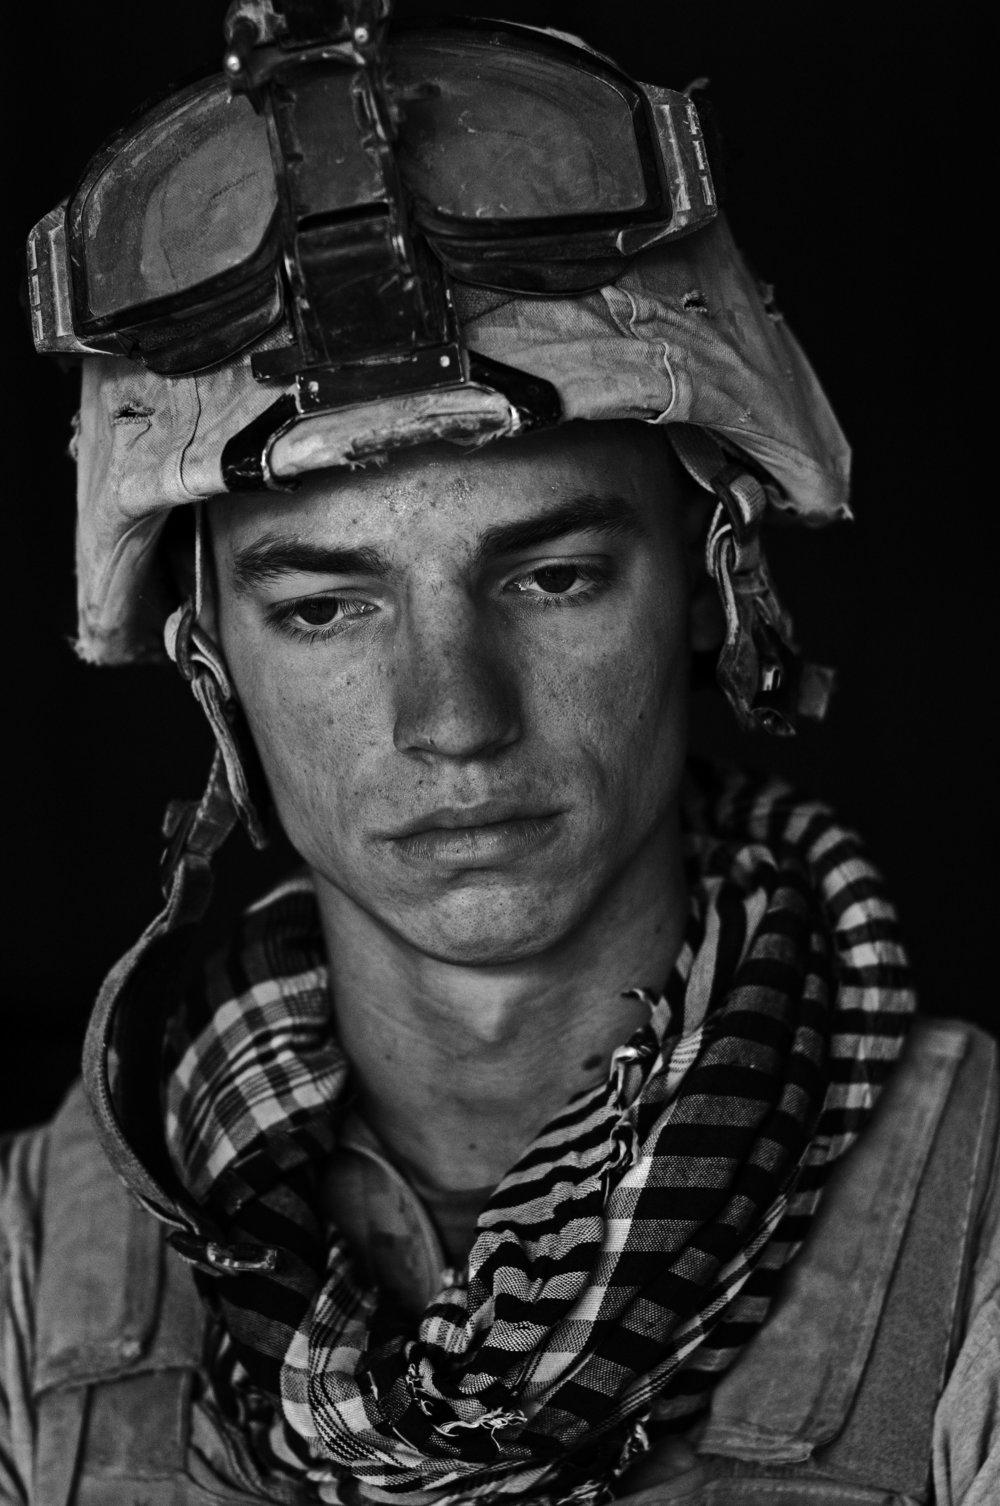 10-U.S. Marine Lcpl. Joshua Wycka